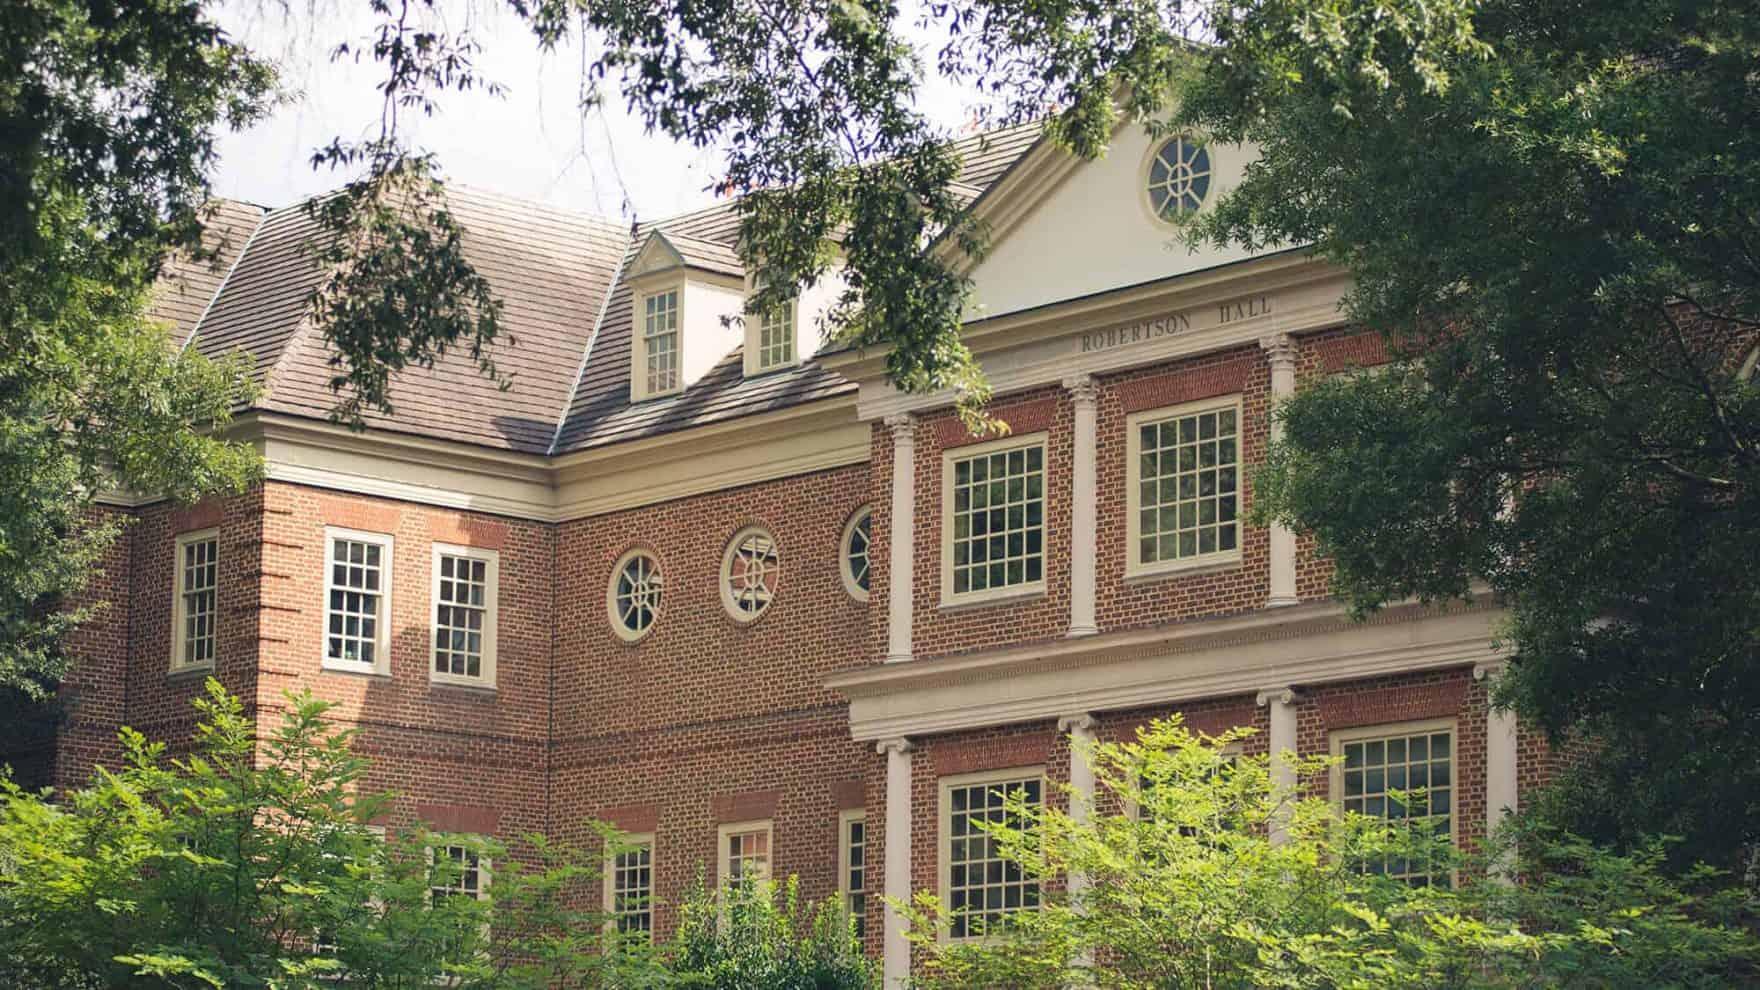 Robertson Hall, which houses the Regent law school in Virginia Beach, VA 23464.